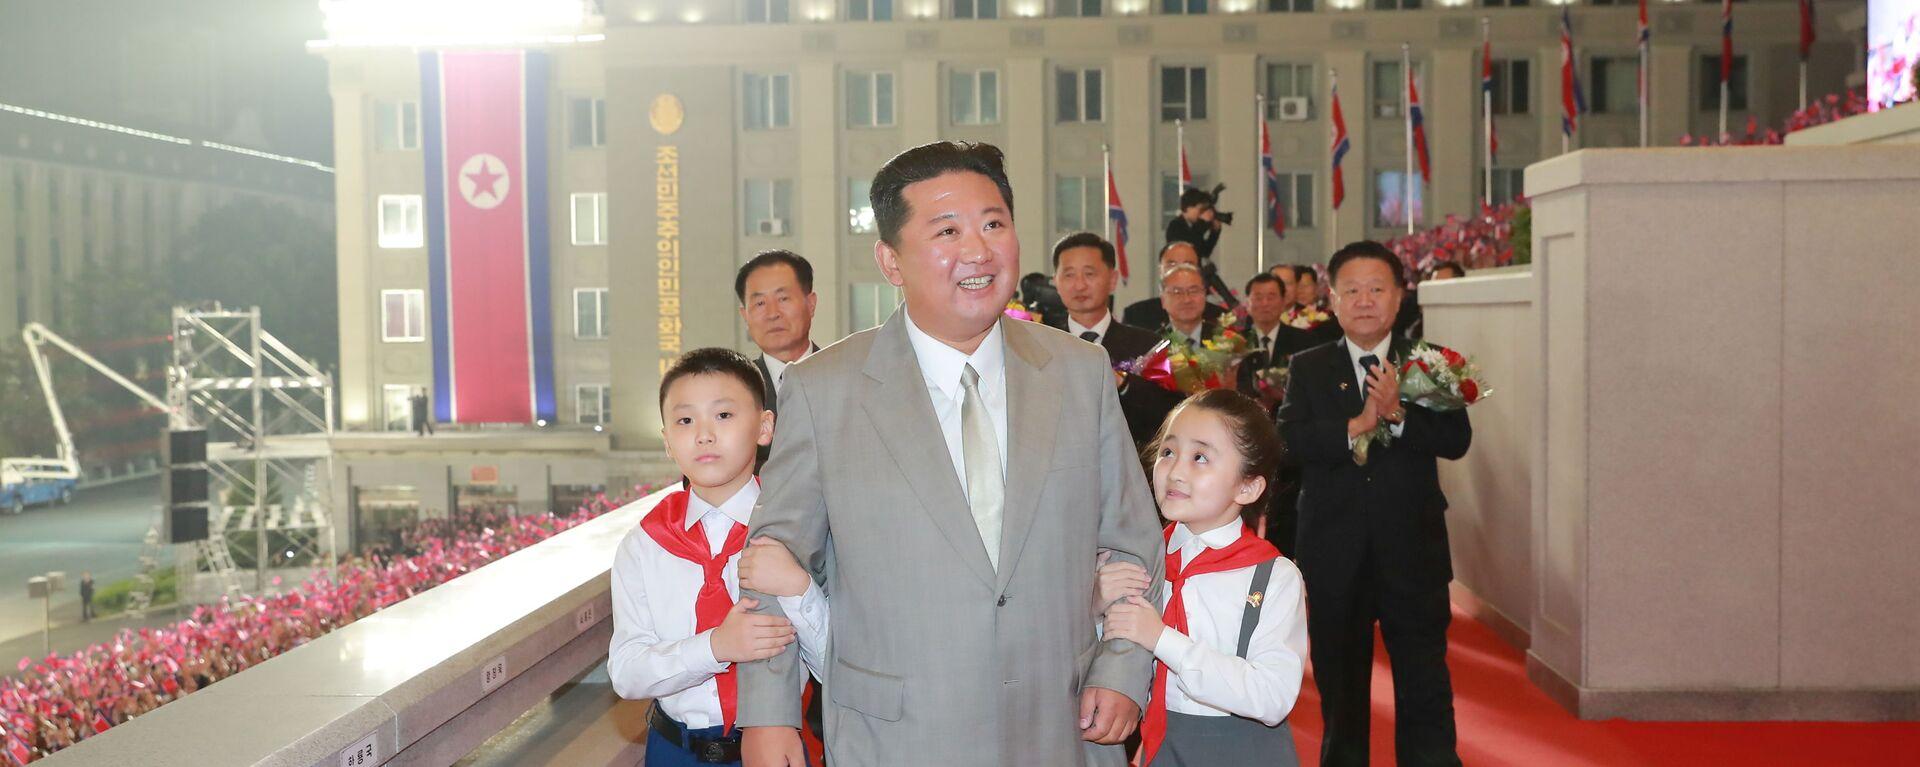 Kim Jong-un, líder de Corea del Norte - Sputnik Mundo, 1920, 13.09.2021